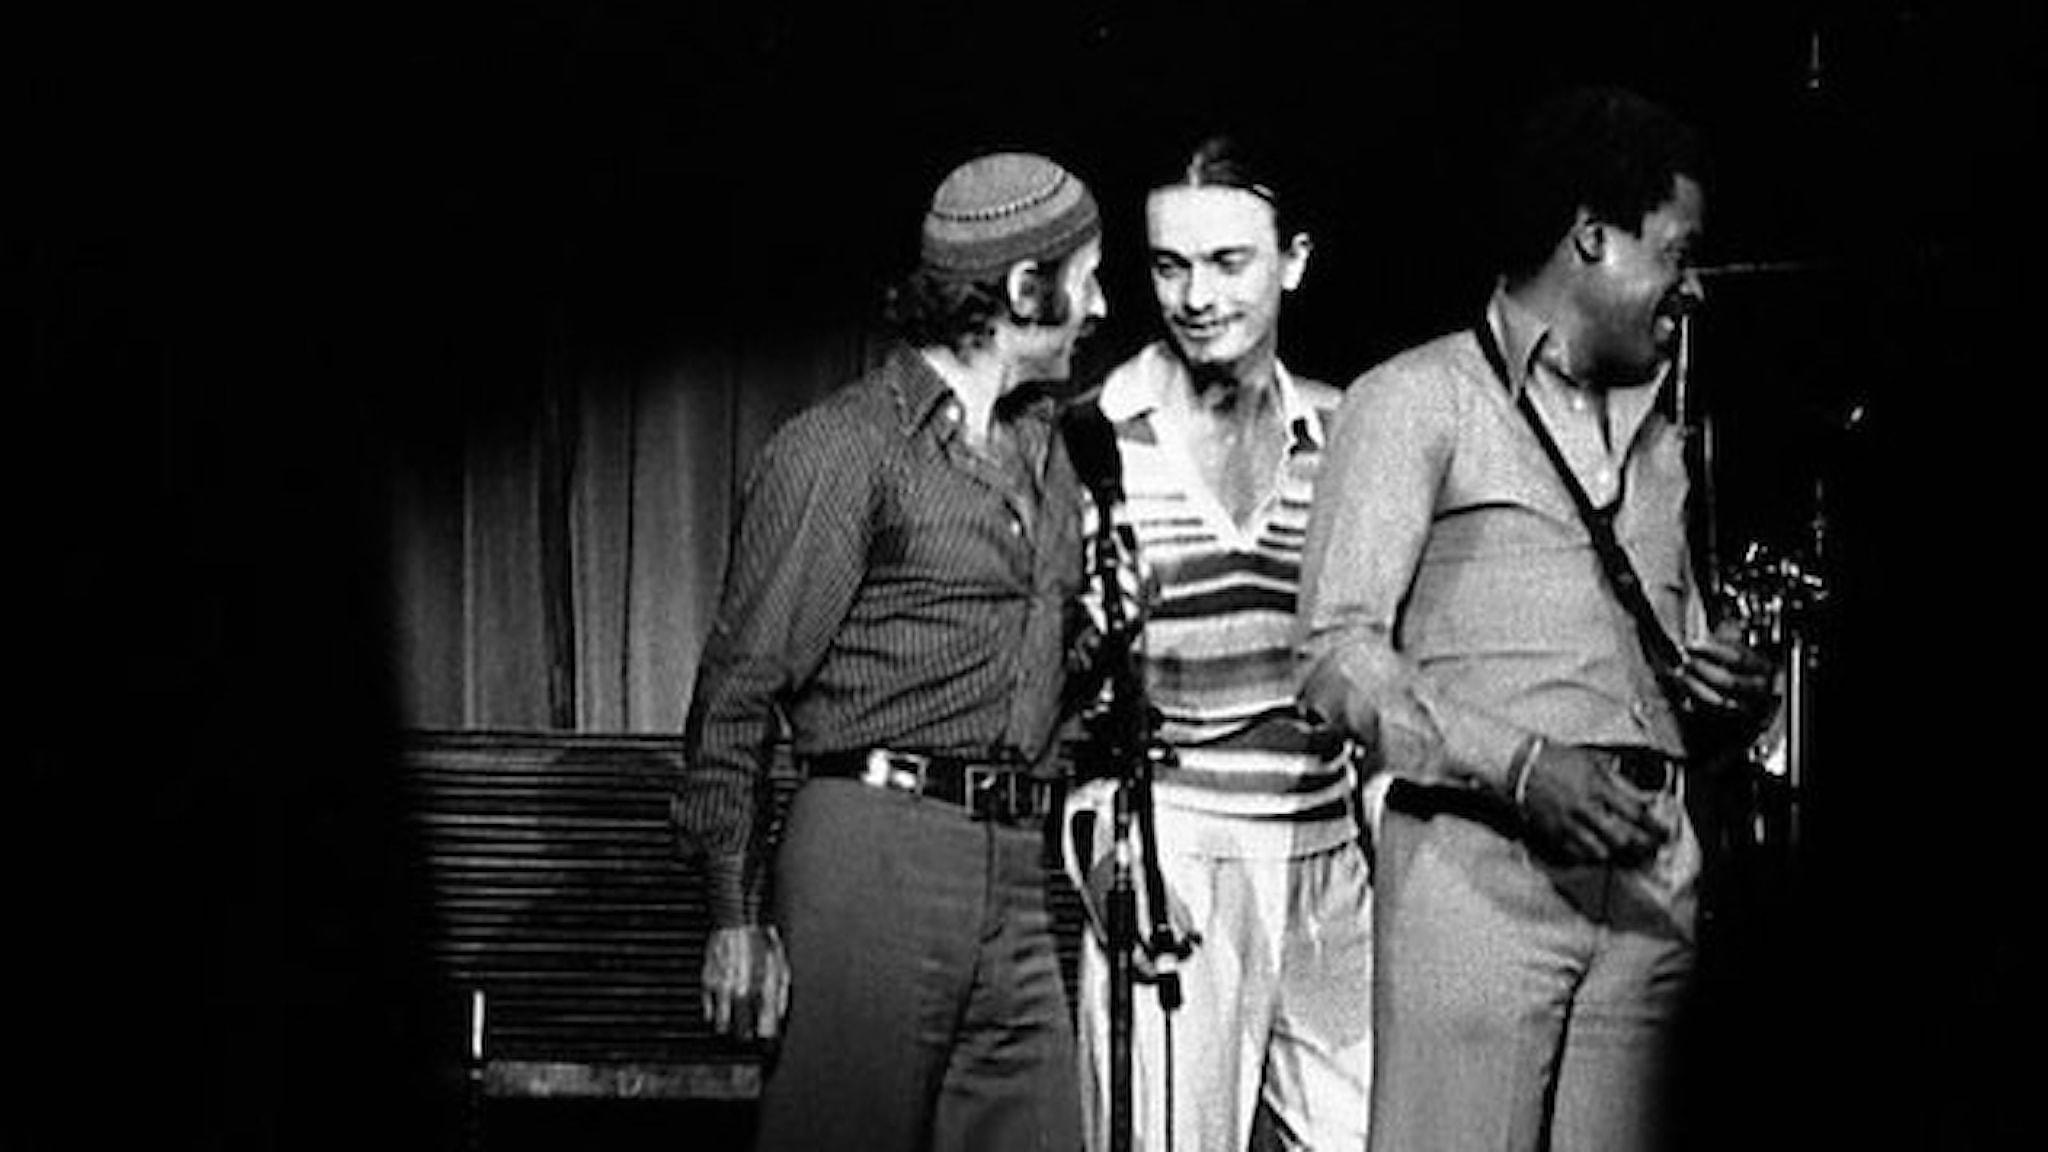 Svartvit bild på Weather Report i Toronto 1977. Joe Zawinul, Jaco Pastorius och Wayne Shorter står på en scen troligen efter konserten. Foto: Wikimedia commons.